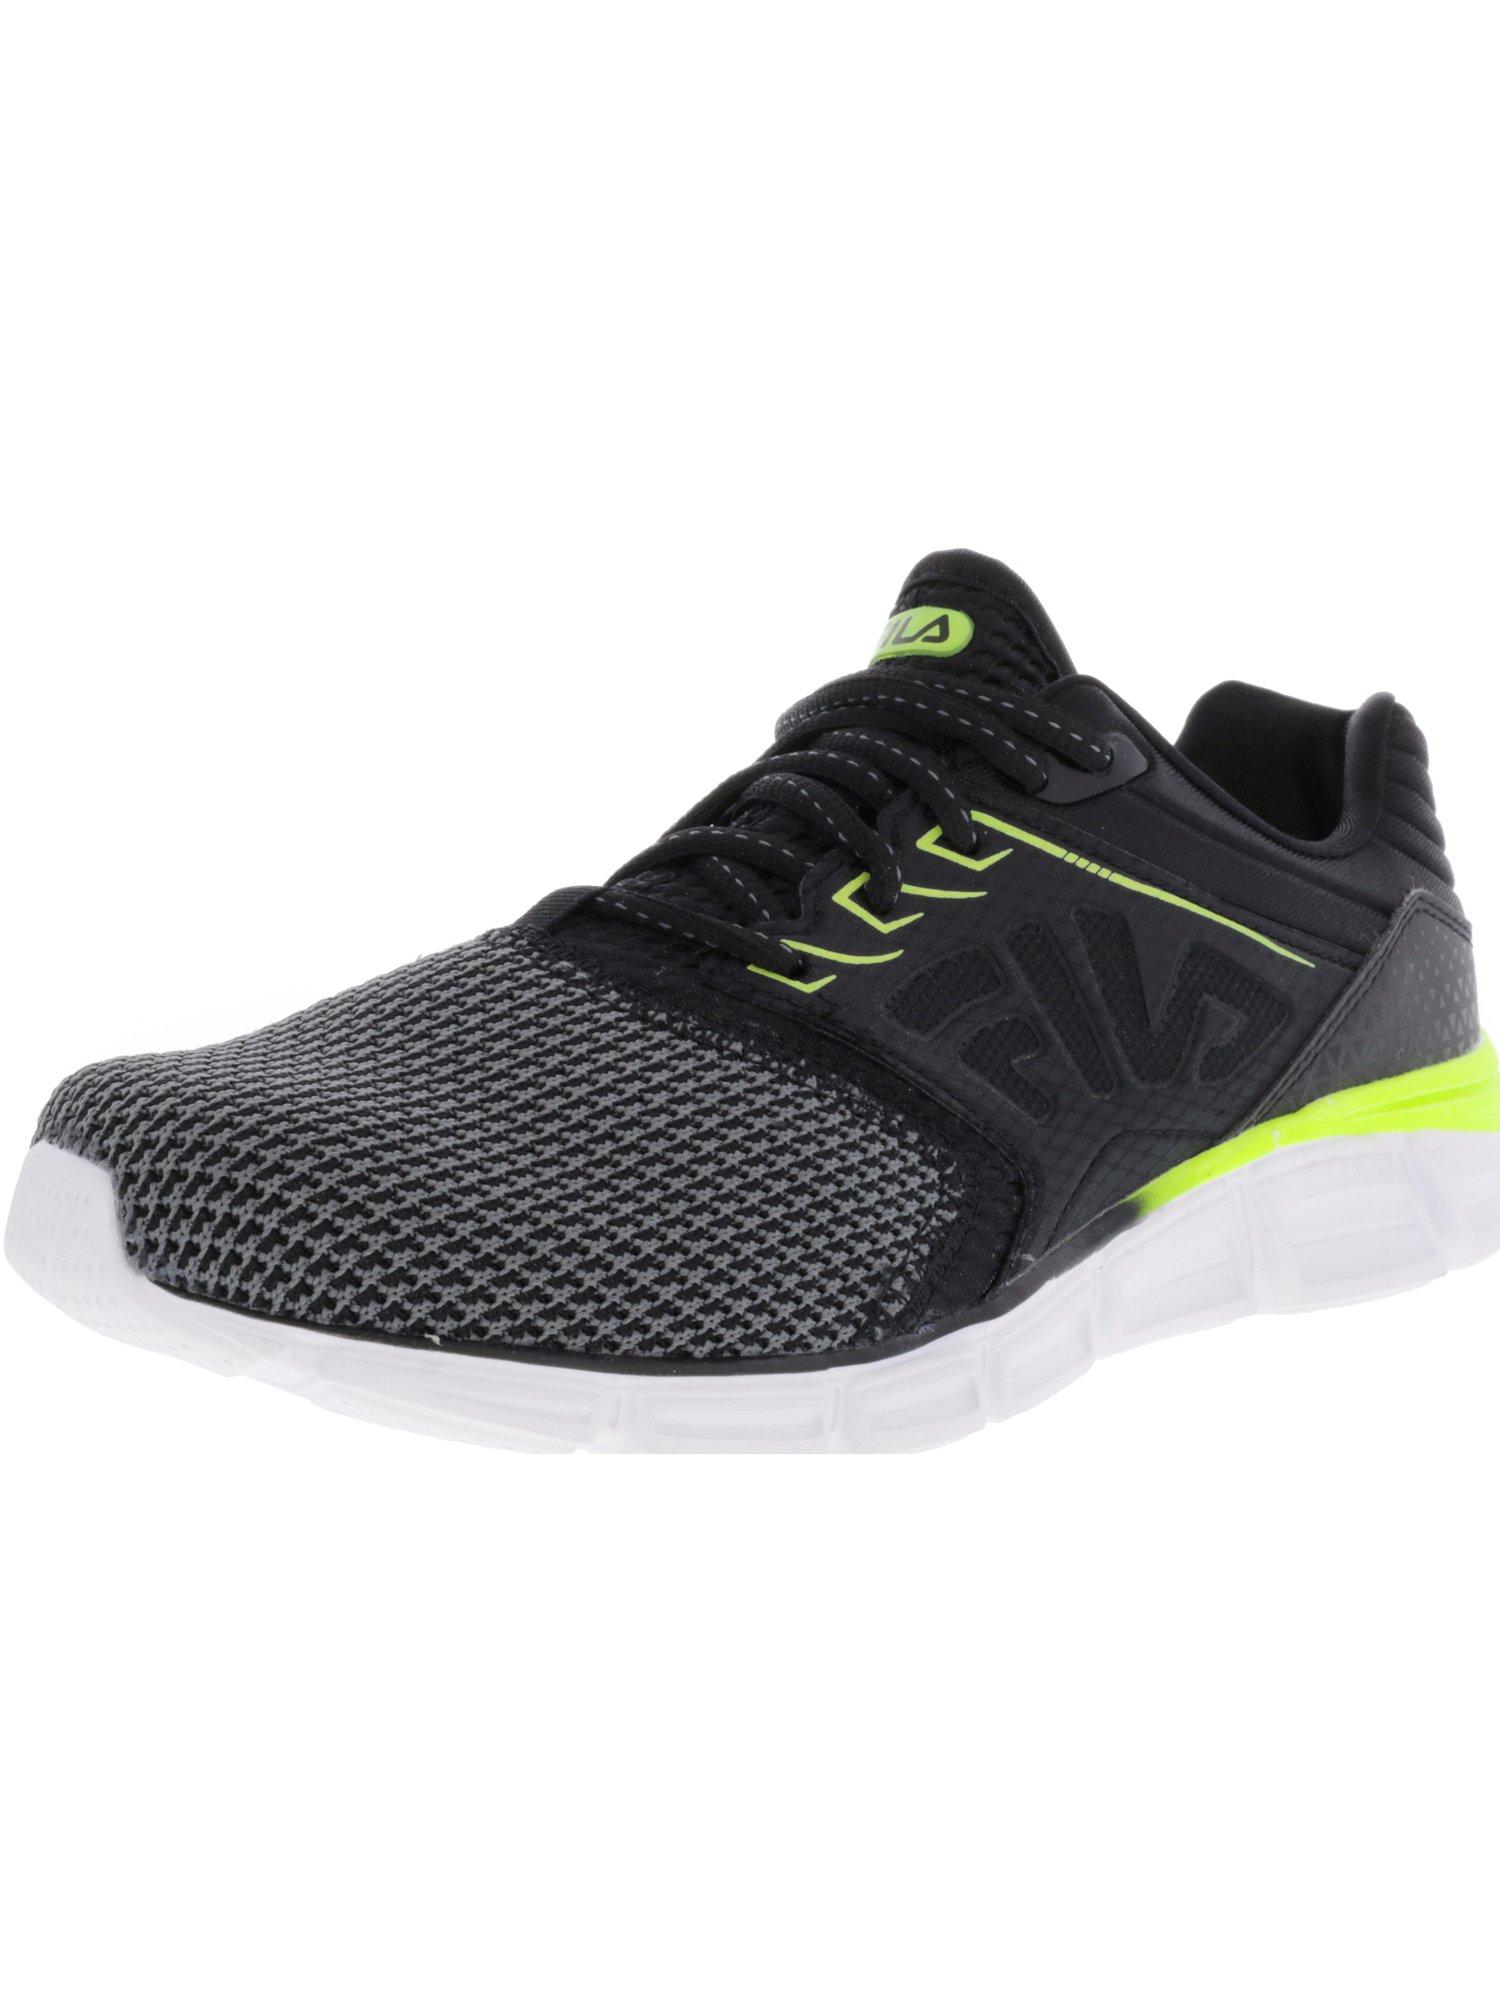 Fila Men's Memory Multiswift 2 Black / Safety Yellow White Ankle-High Running Shoe - 8M